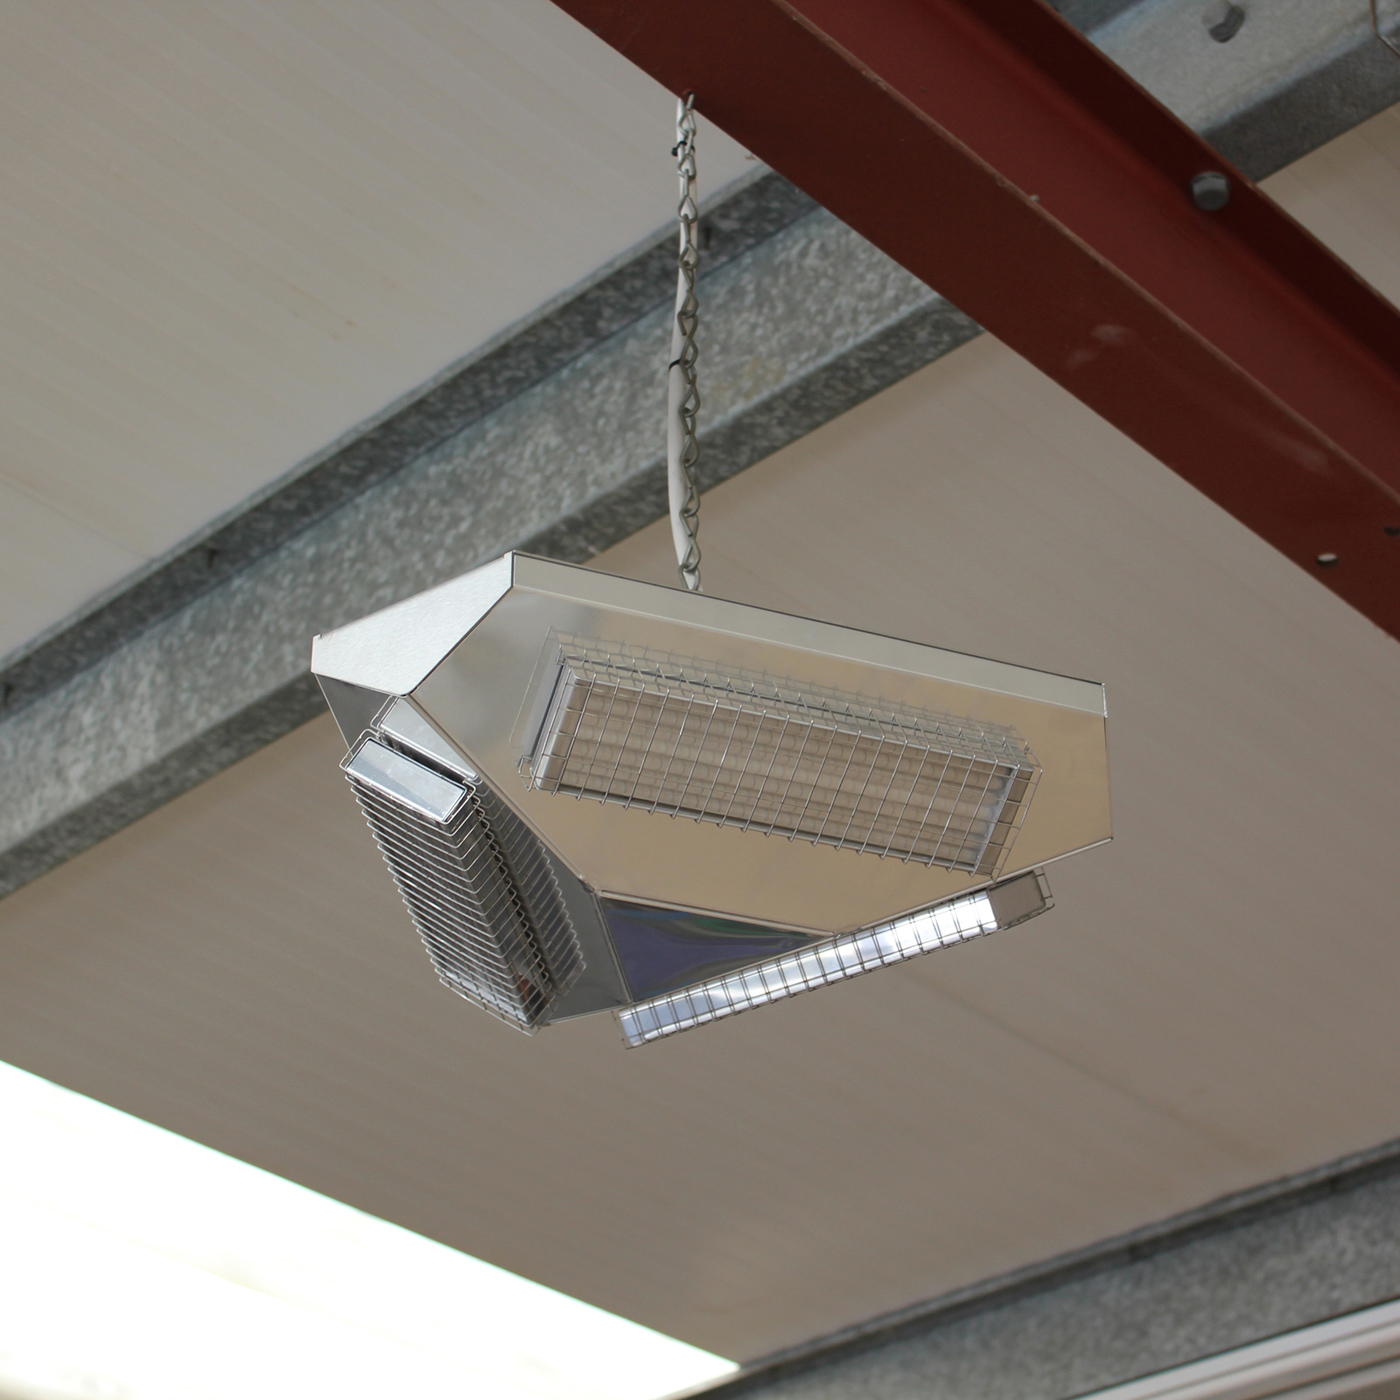 Herschel Advantage Ir360 1950w Silver Far Infrared Ceiling Mounted Workshop Heater